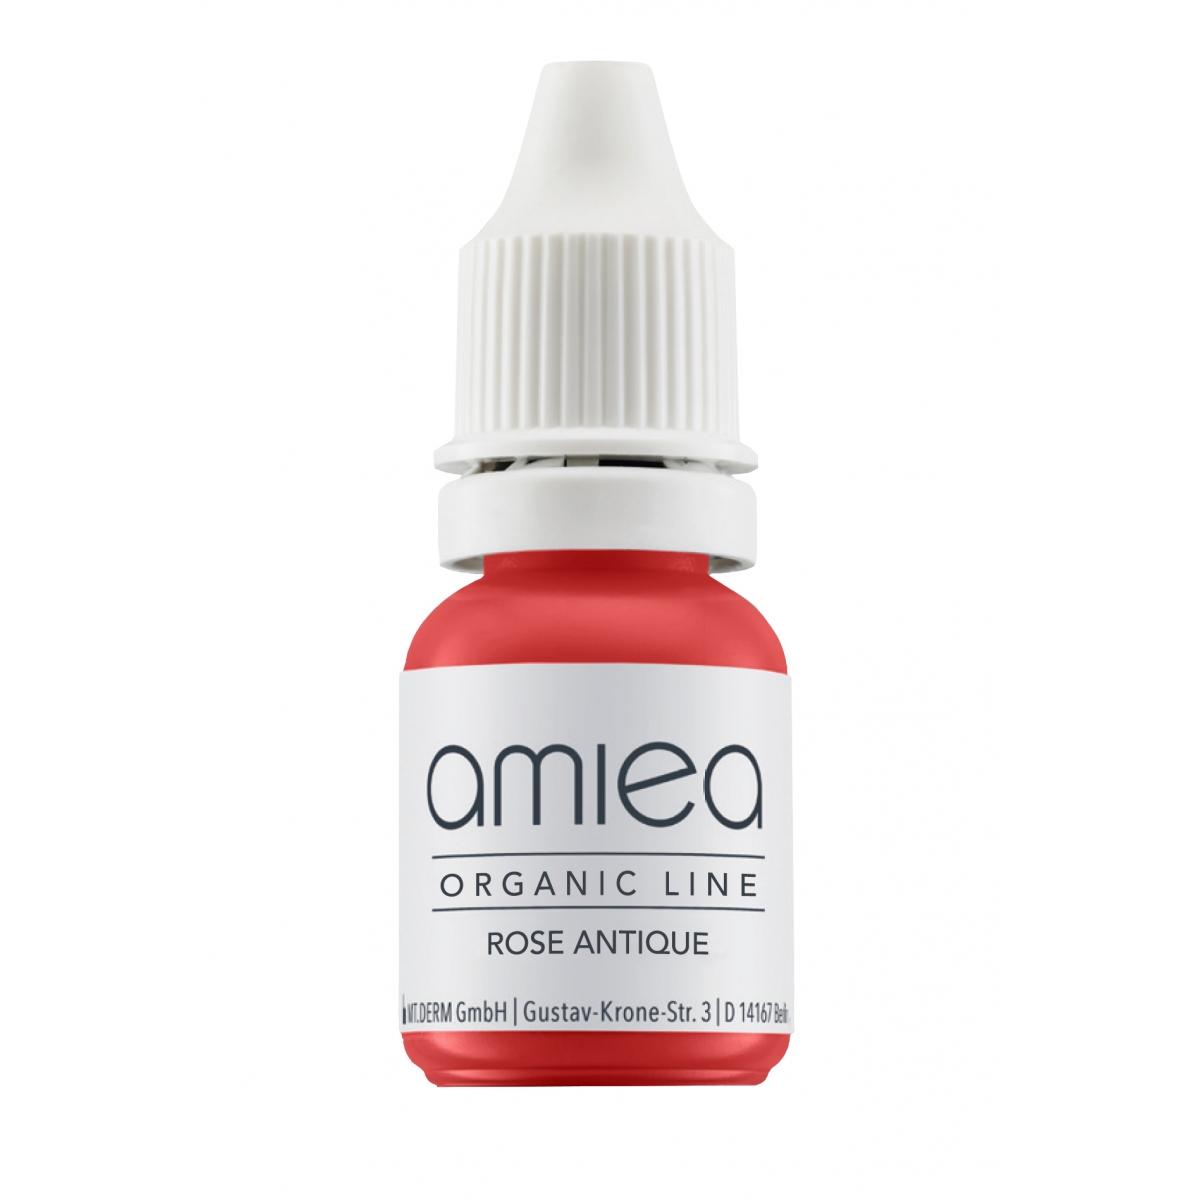 ORGANIC LINE  - PIGMENT ROSE ANTIQUE ORGANICLINE AMIEA